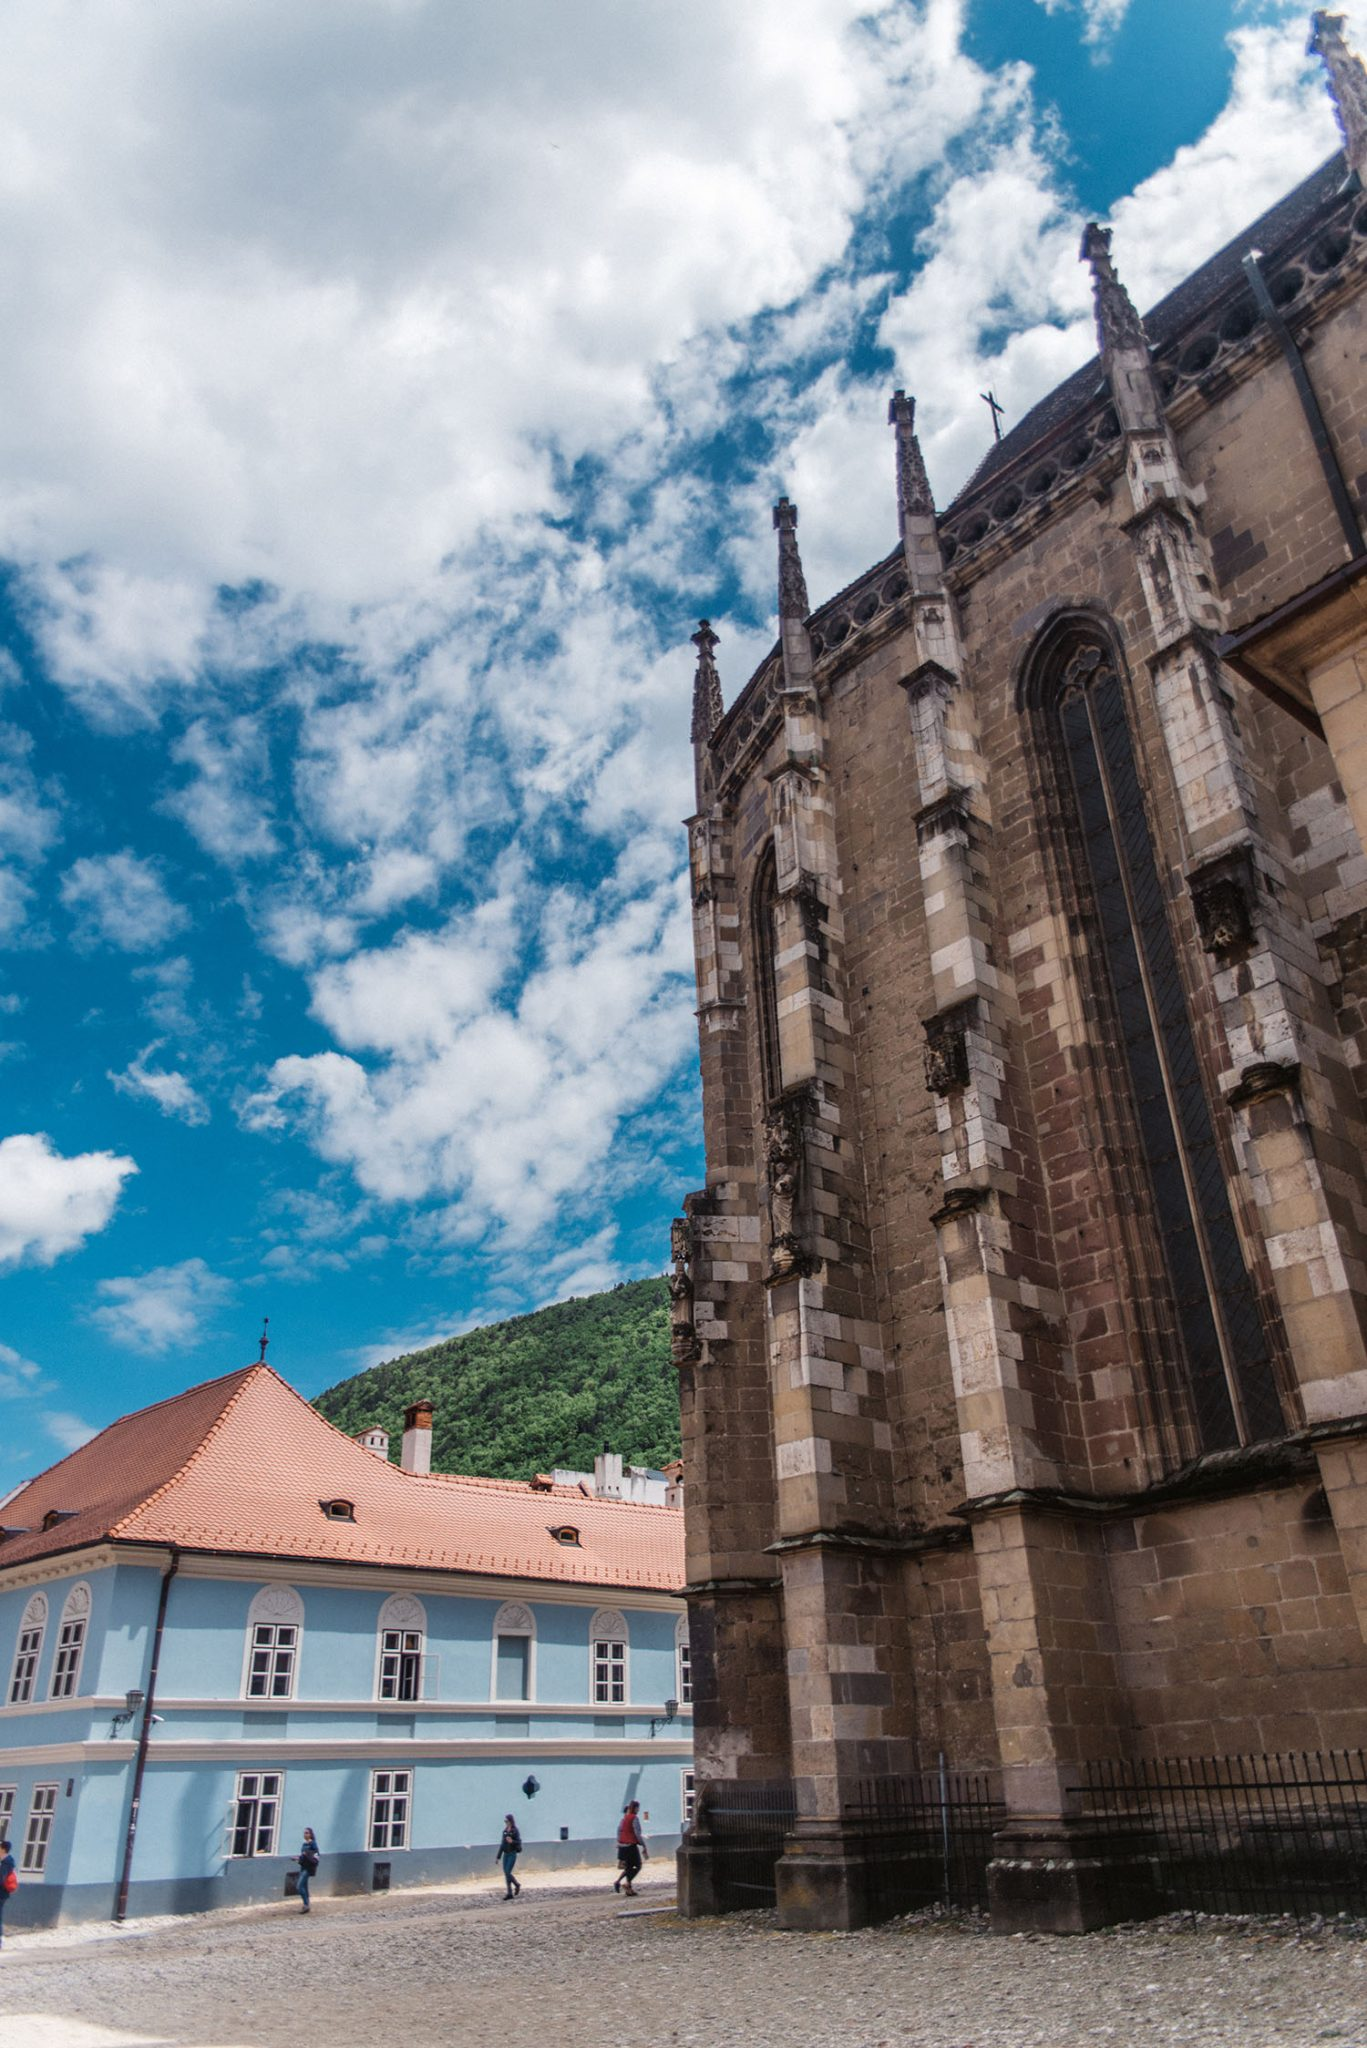 The Blach Church (Saint Mary's Church) in Braşov, Transylvania